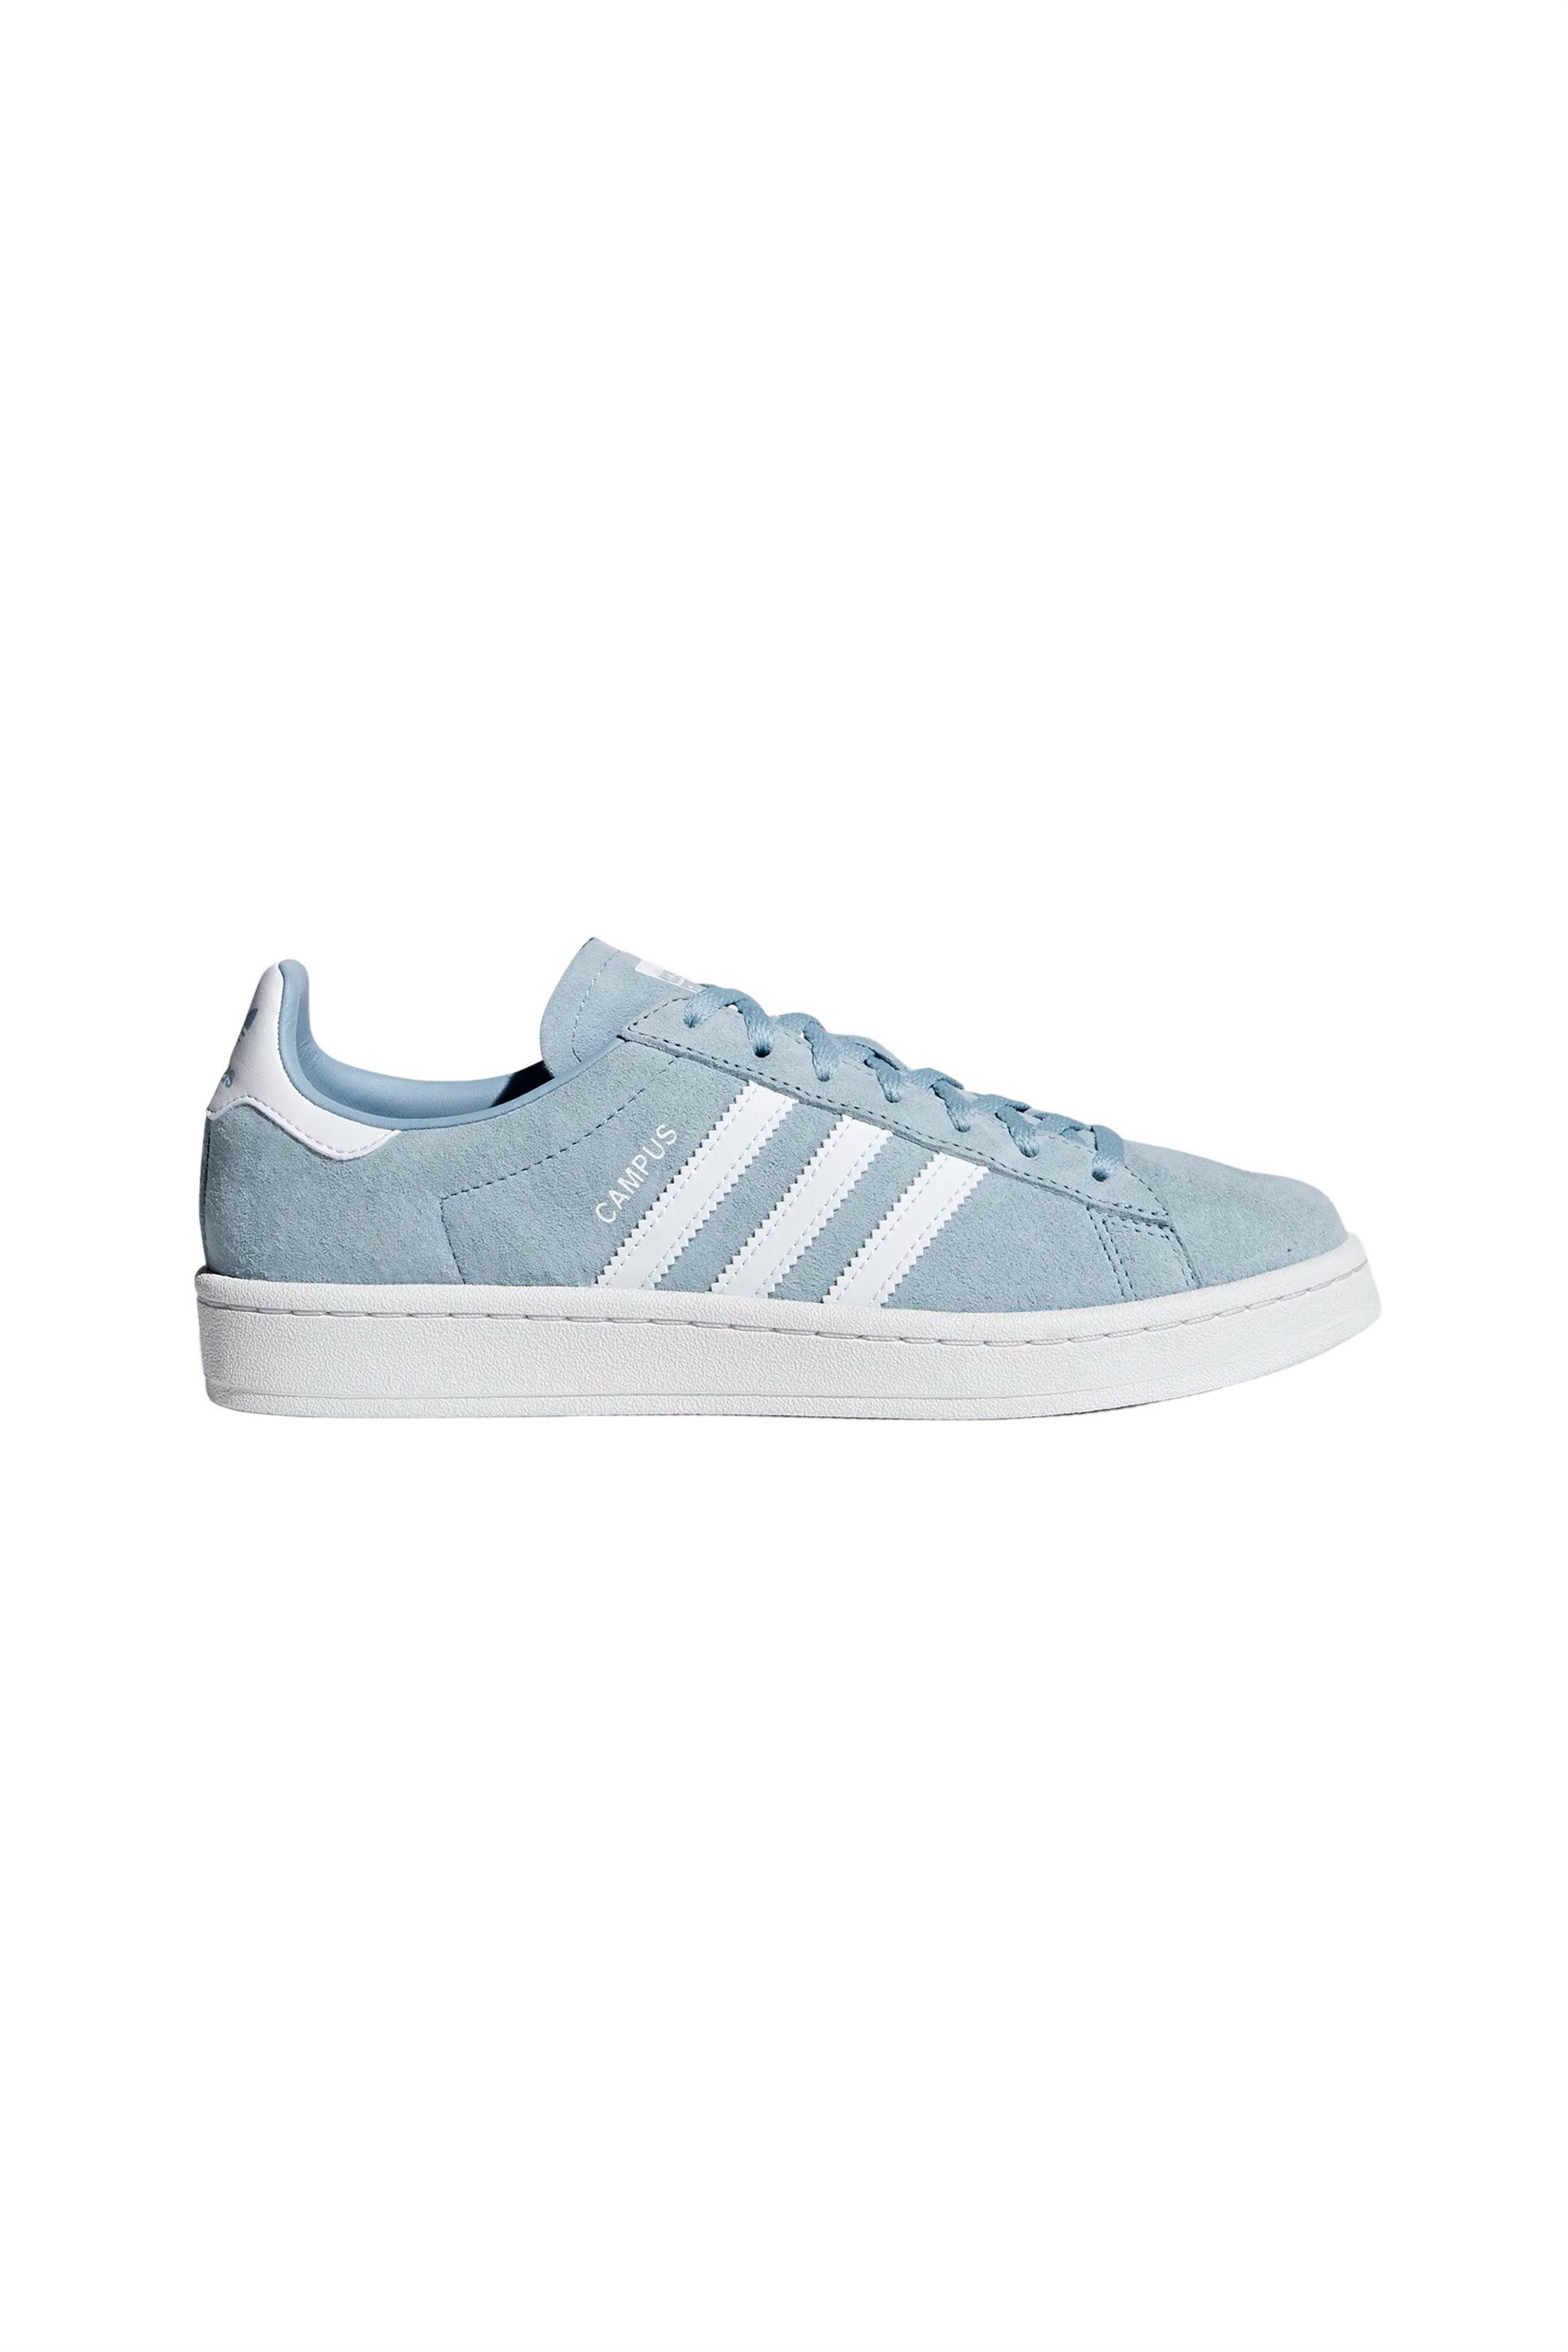 609c93a789 Notos Adidas γυναικεία sneakers Campus – CG6048 – Γαλάζιο